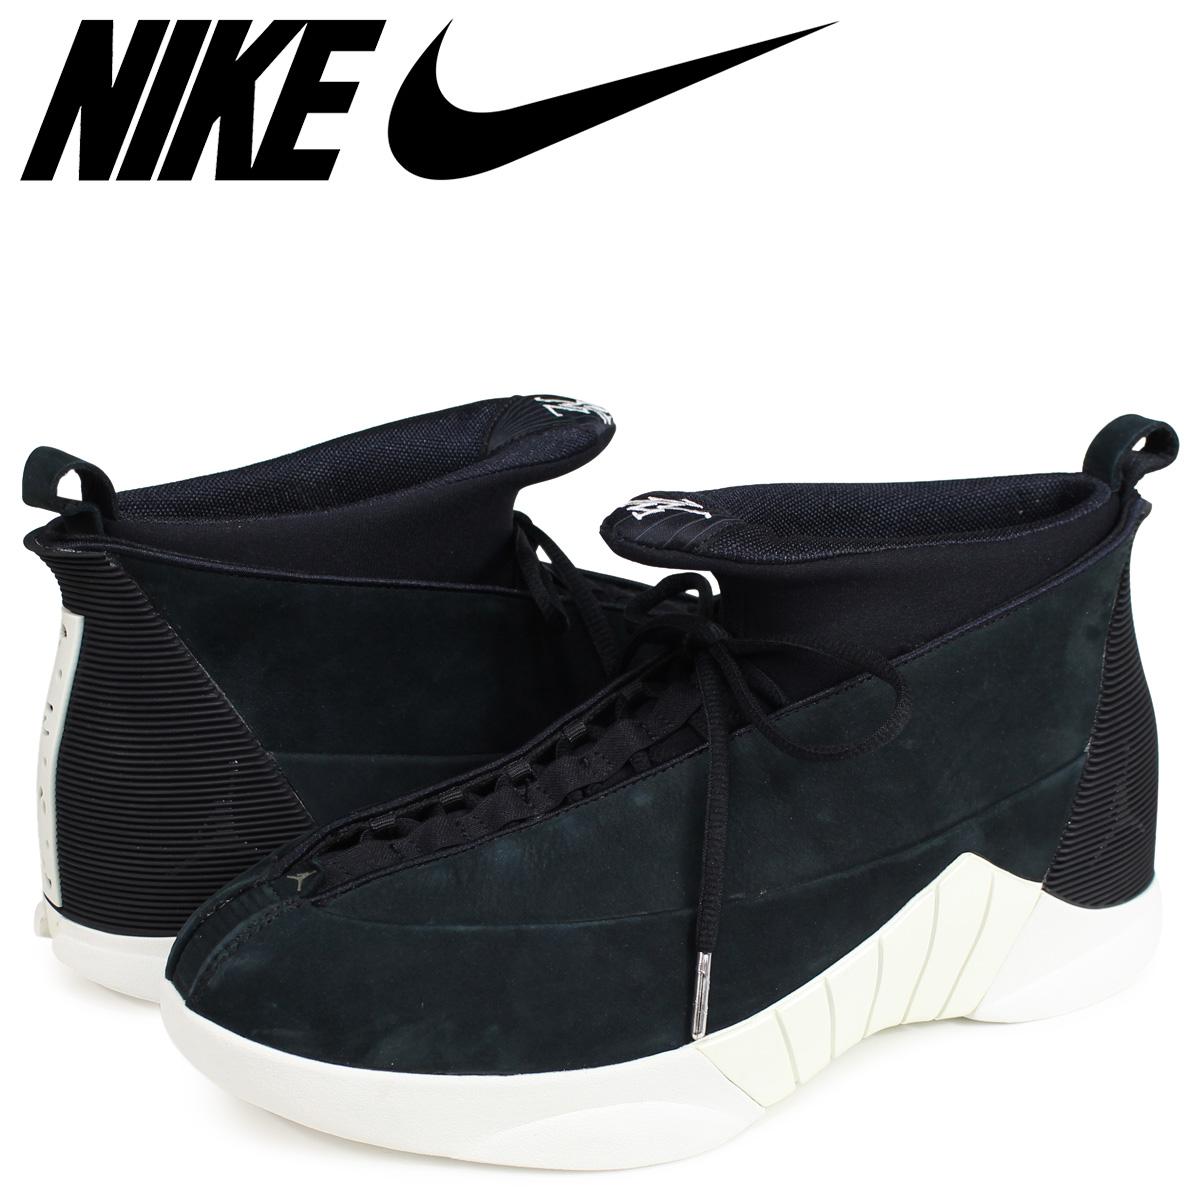 043856d51a7 ... promo code for nike air jordan 15 retro psny nike air jordan 15  nostalgic sneakers 921194